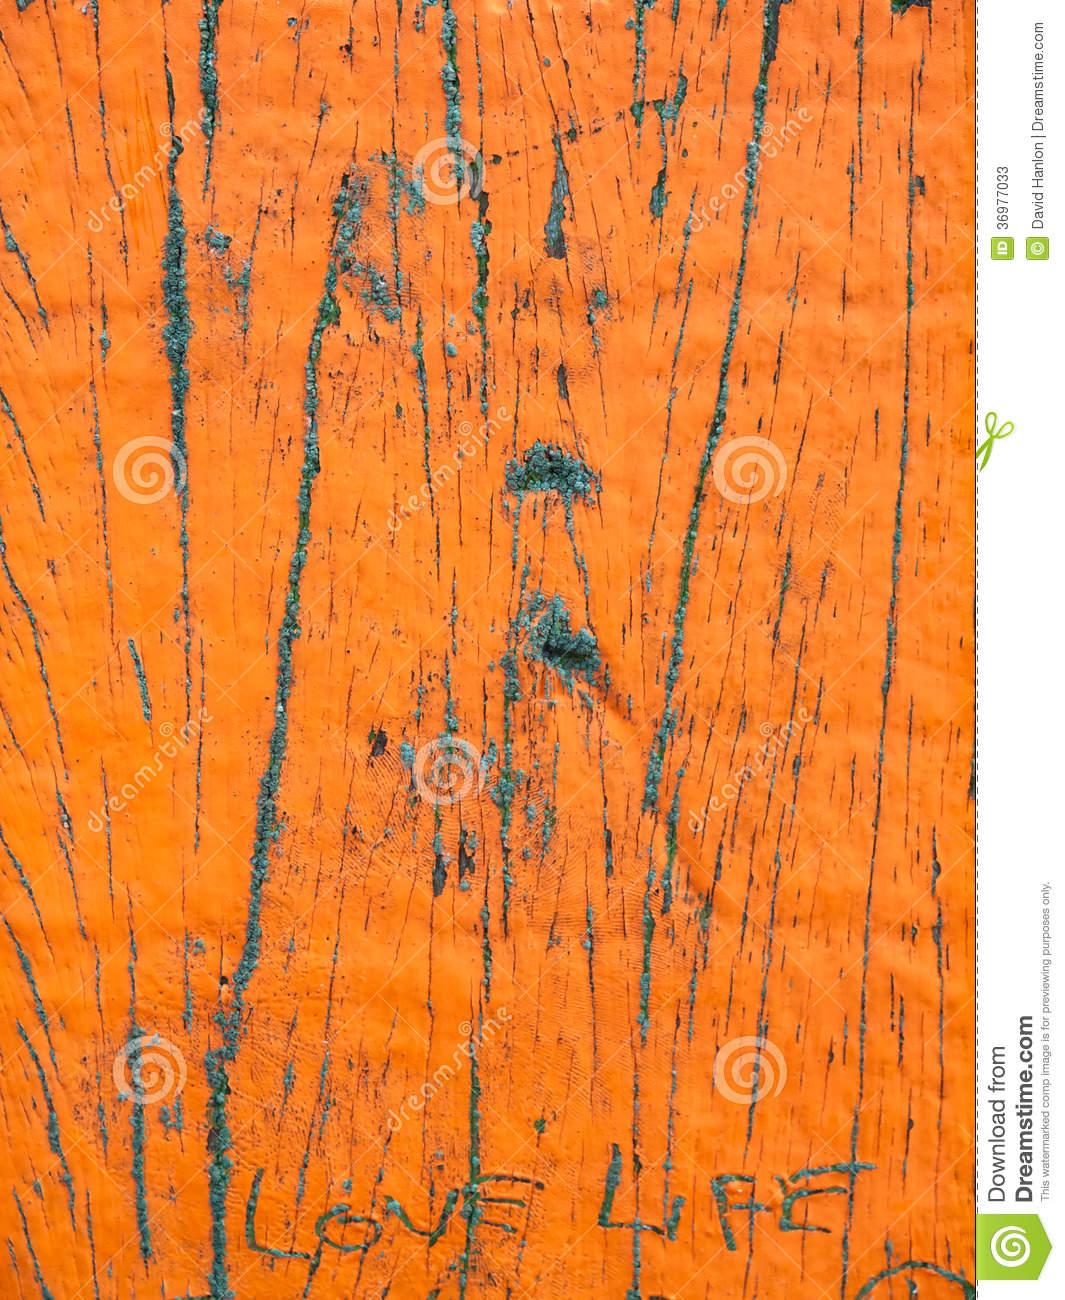 Flaking Paint On Weathered Wood Stock Photos.